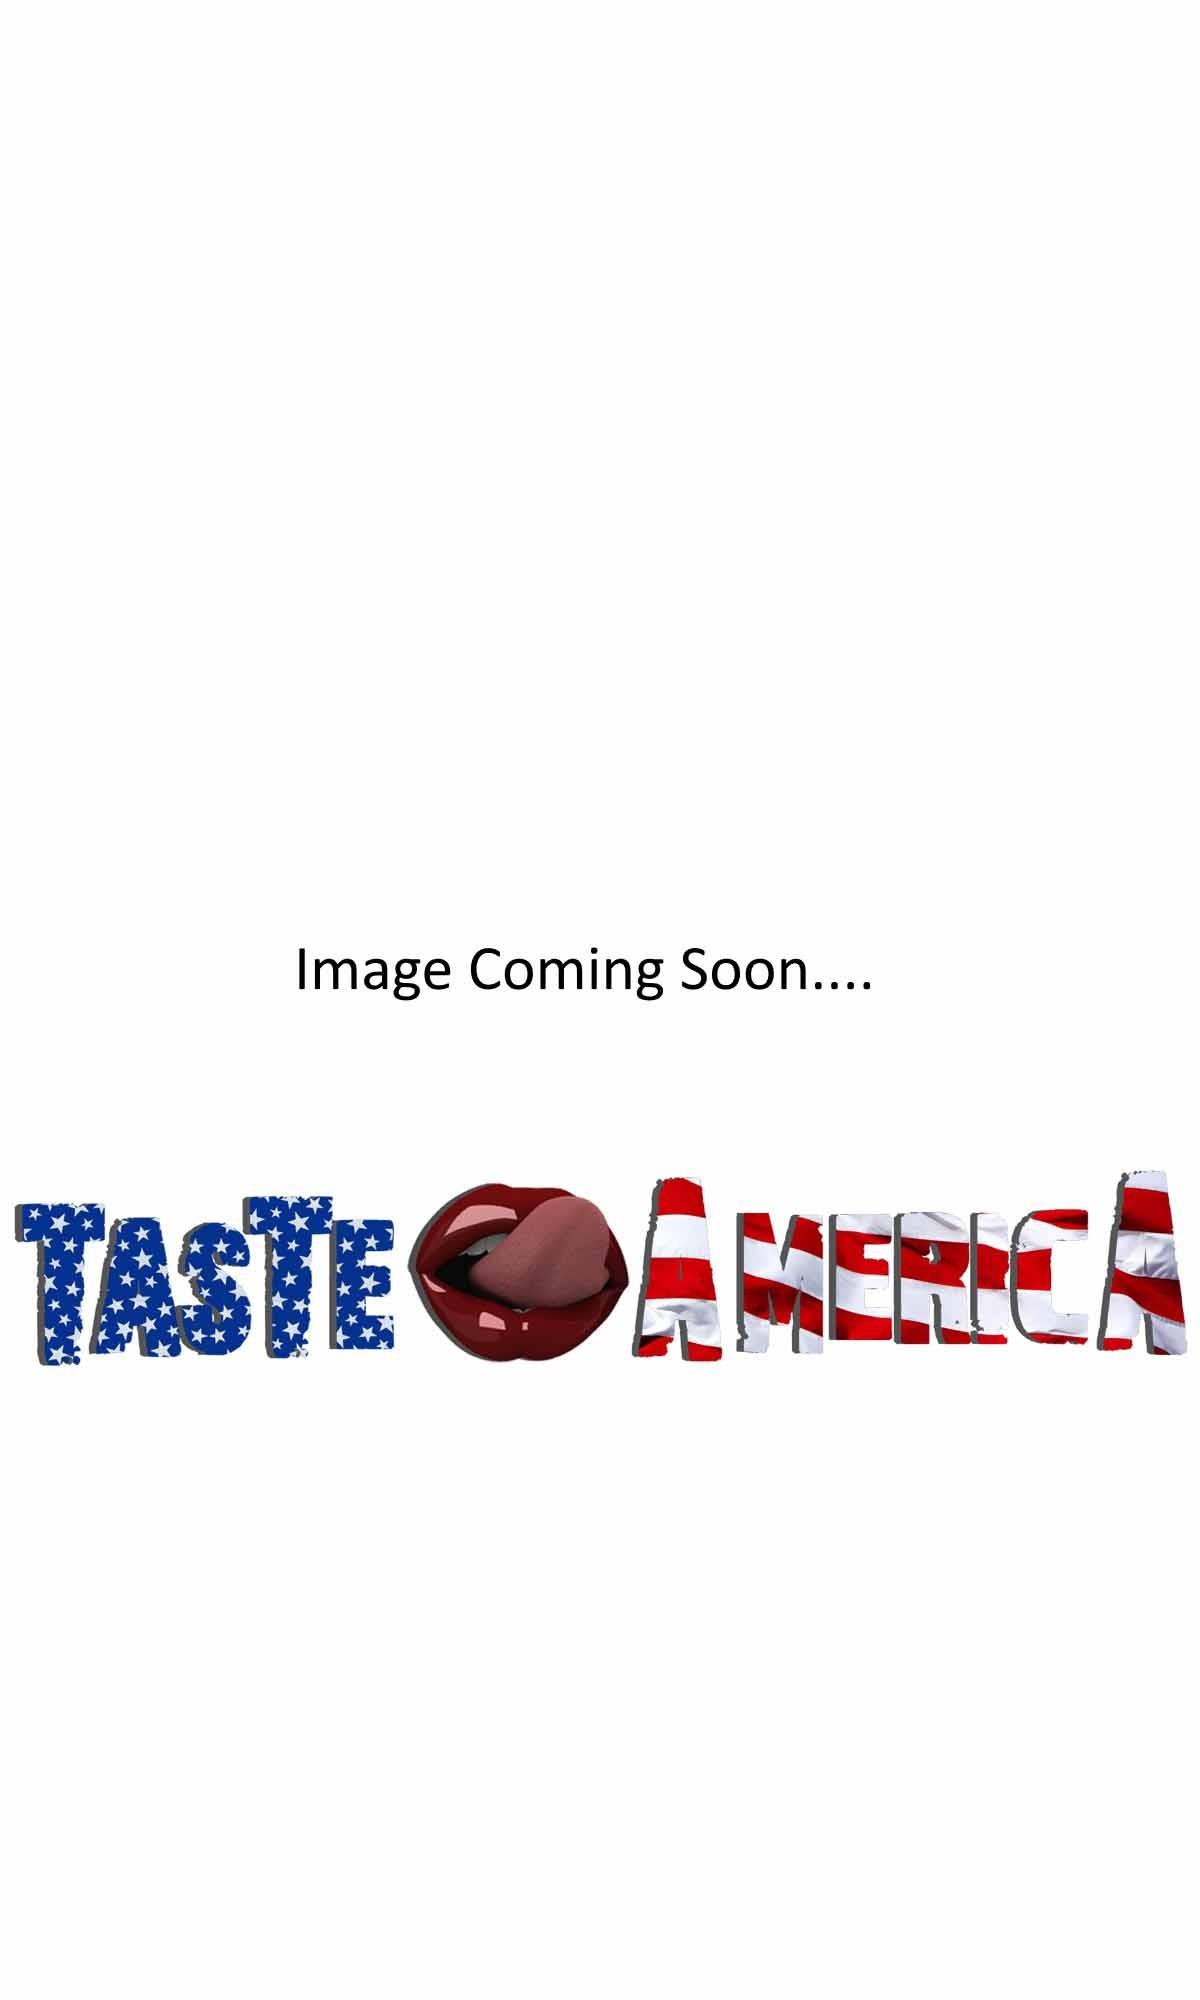 Buy Pillsbury Chocolate Fudge 13 x 9 Family Size Bownie Mix AT Taste America Ltd